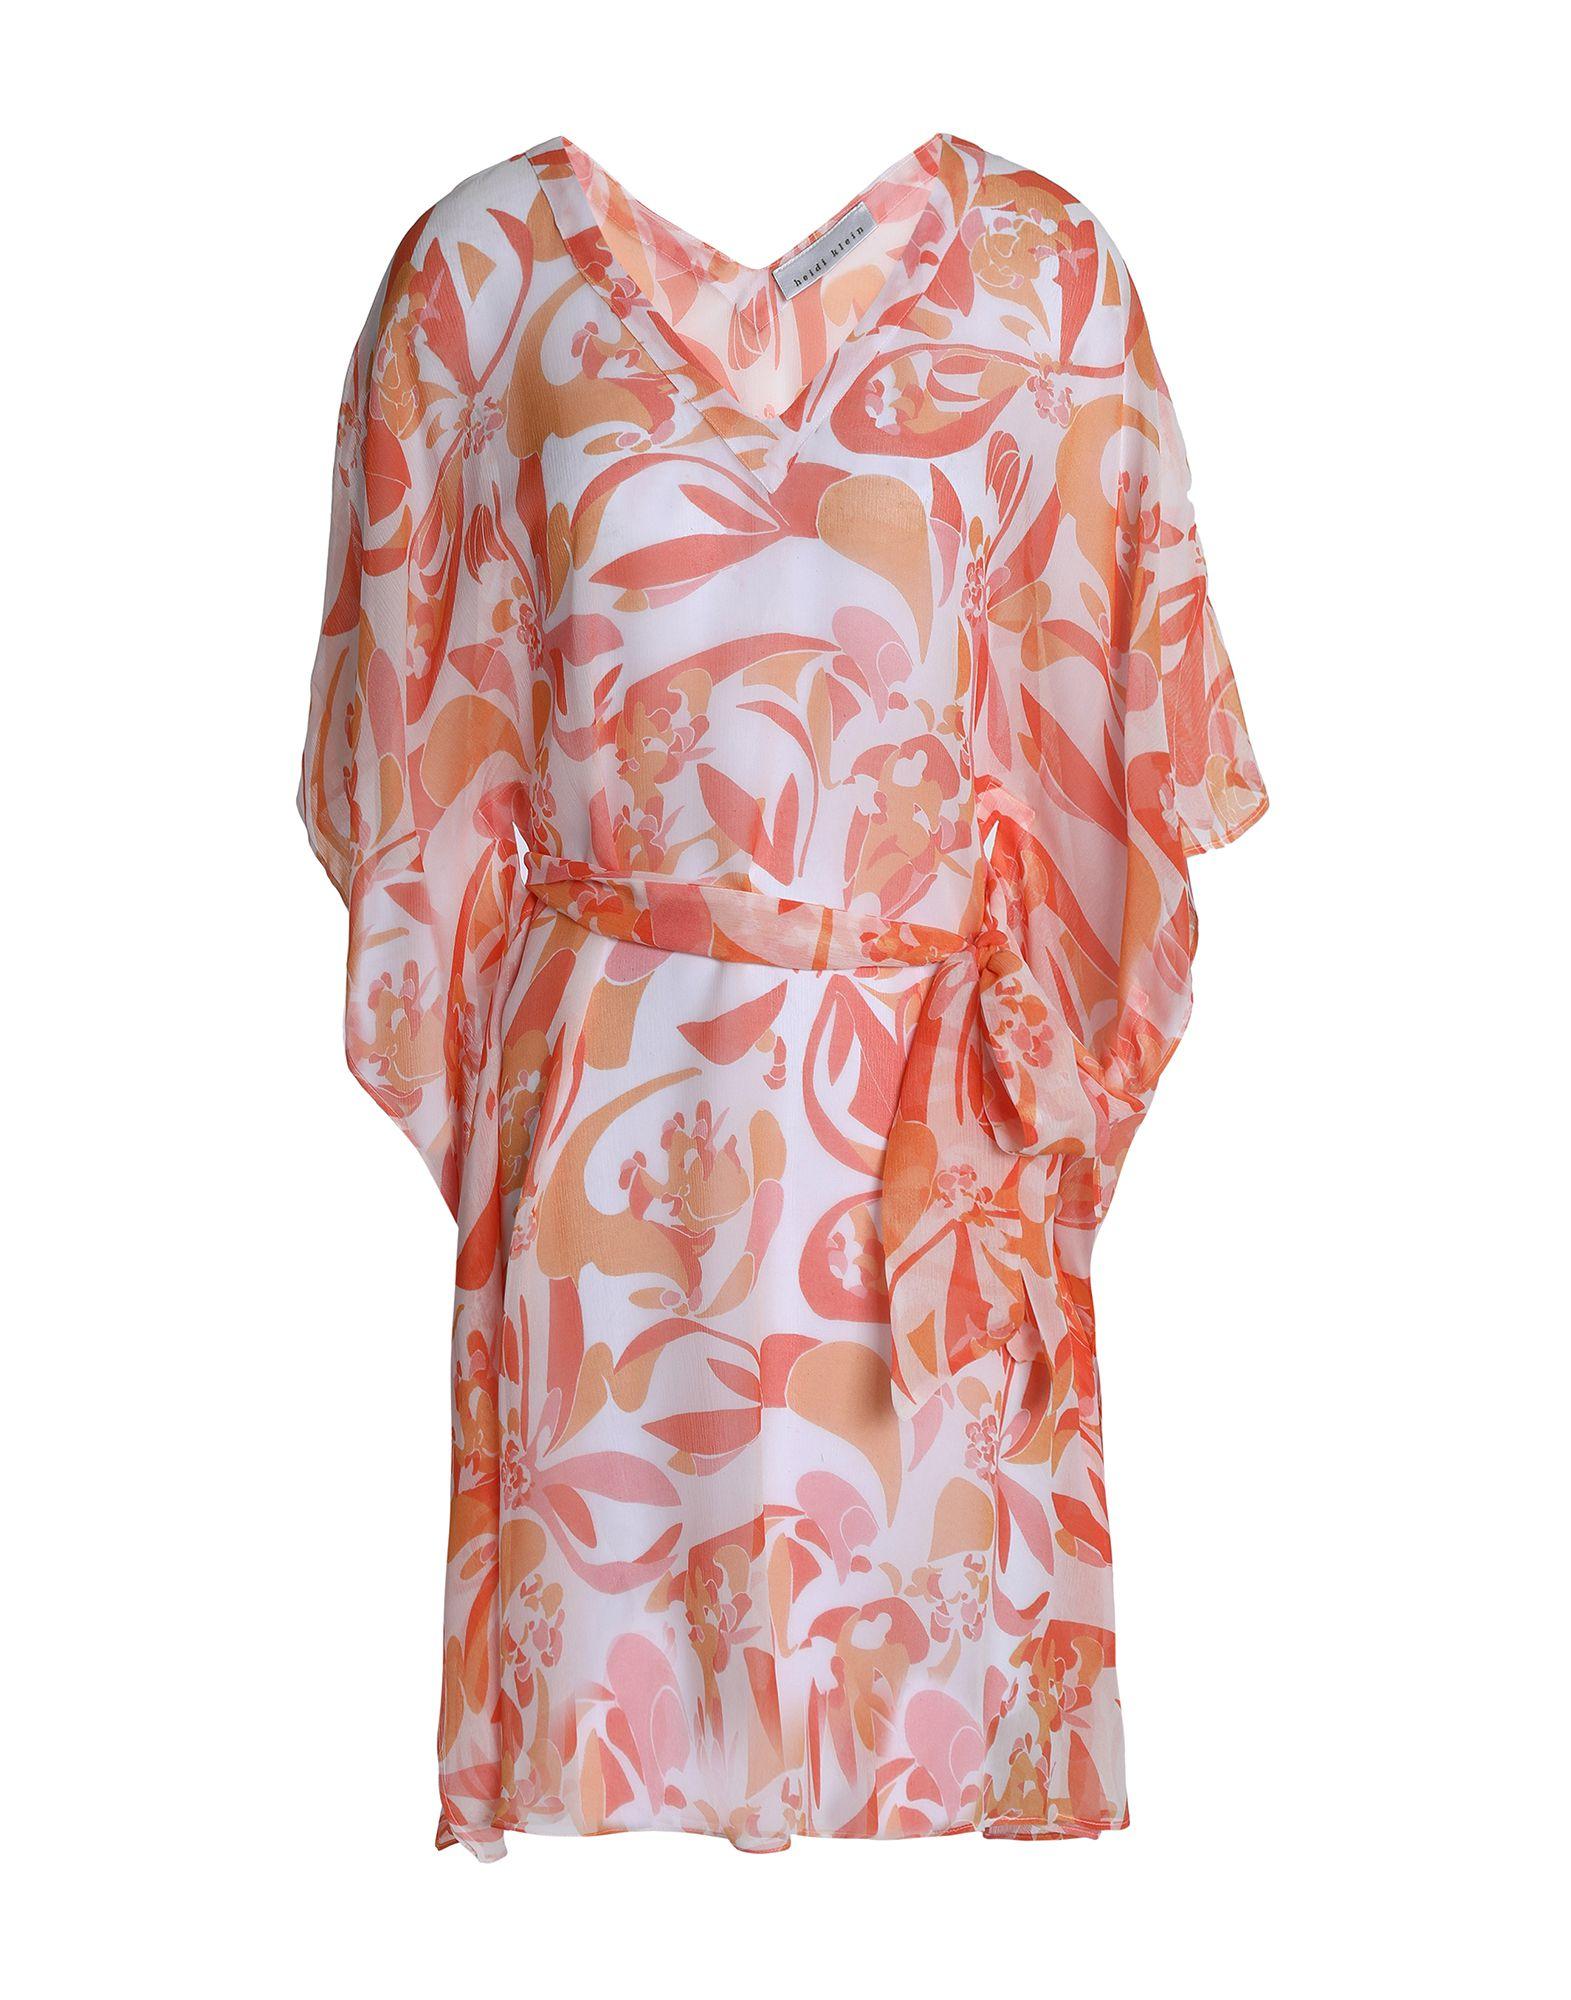 HEIDI KLEIN Пляжное платье платье пляжное heidi klein